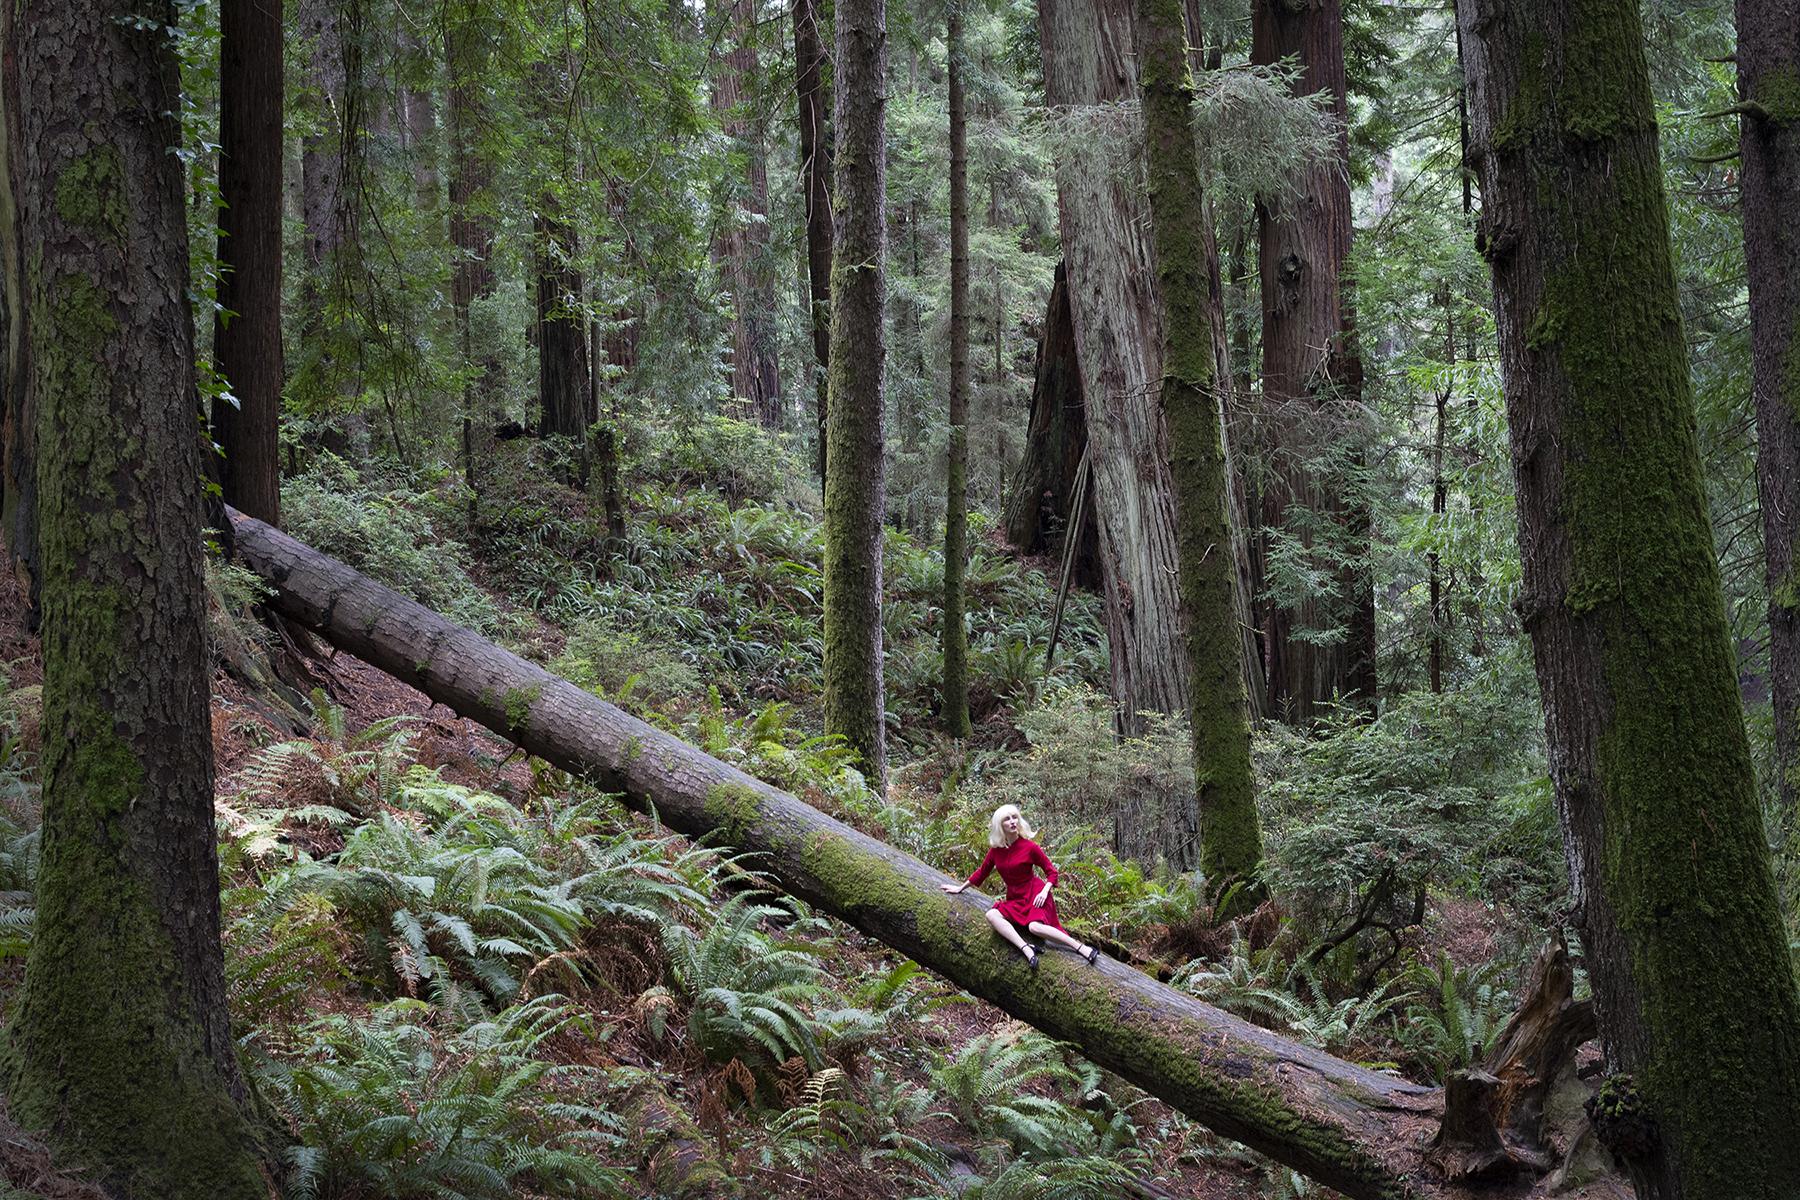 Nicole_Cudzilo_TheEdge_Forest_4.jpg